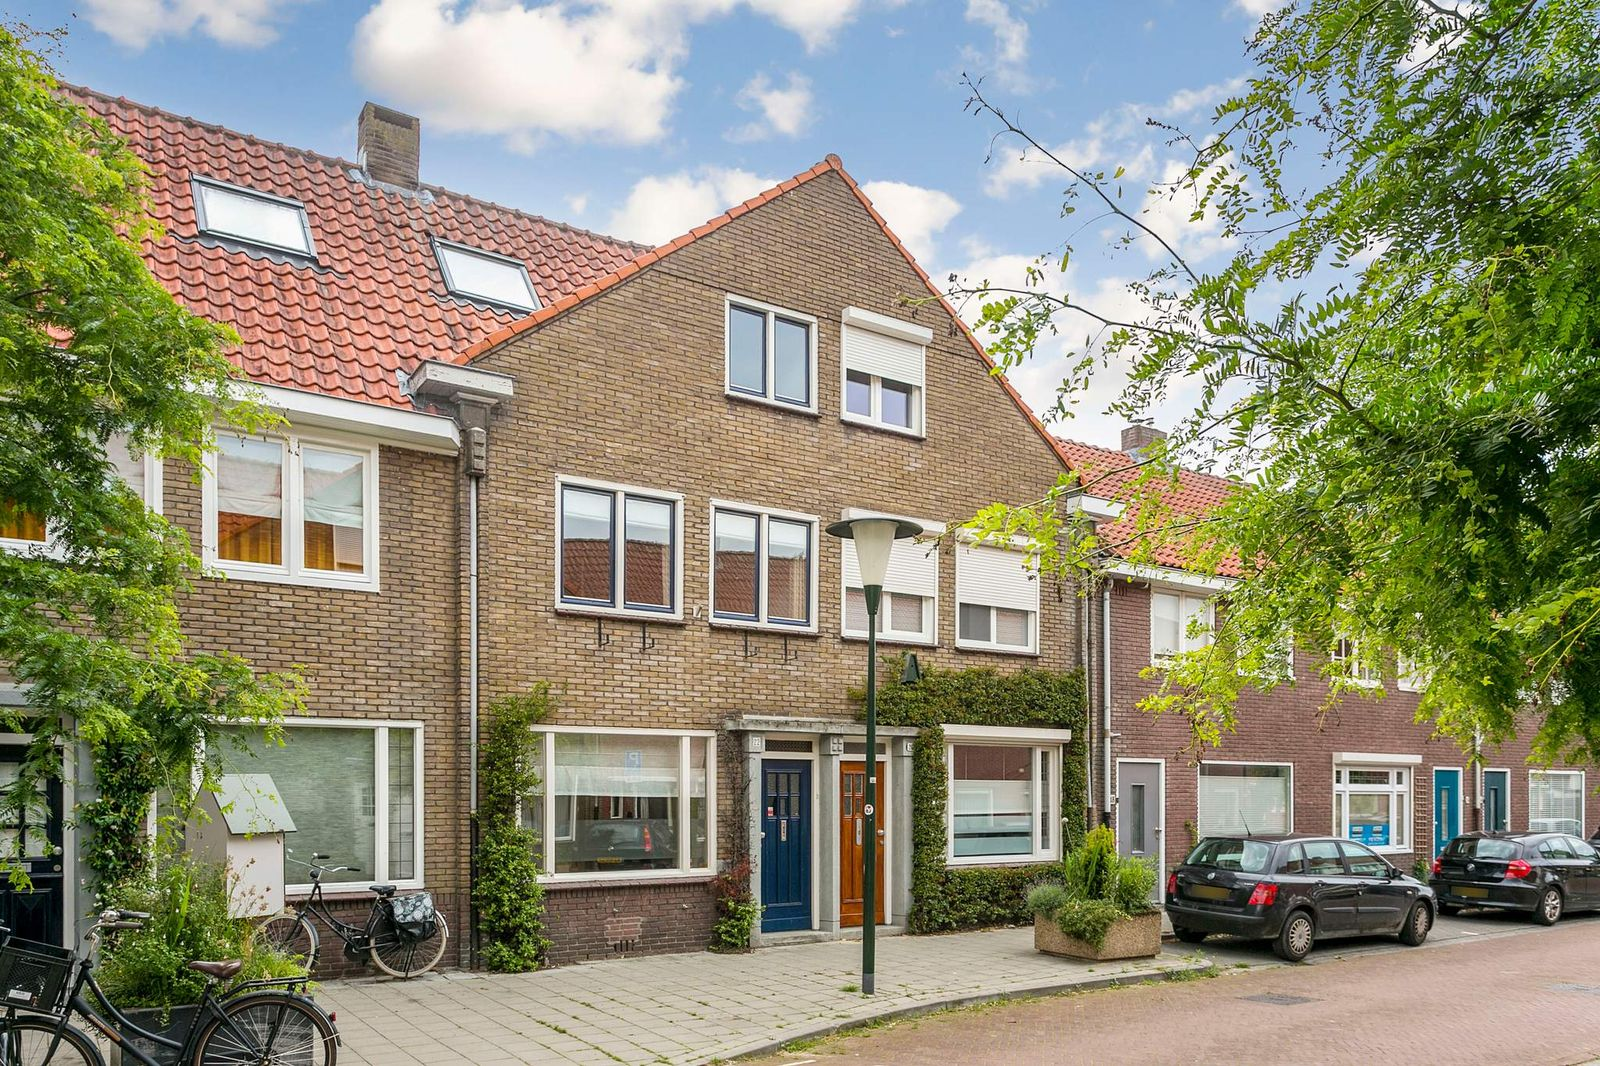 Centauriestraat 22, Eindhoven